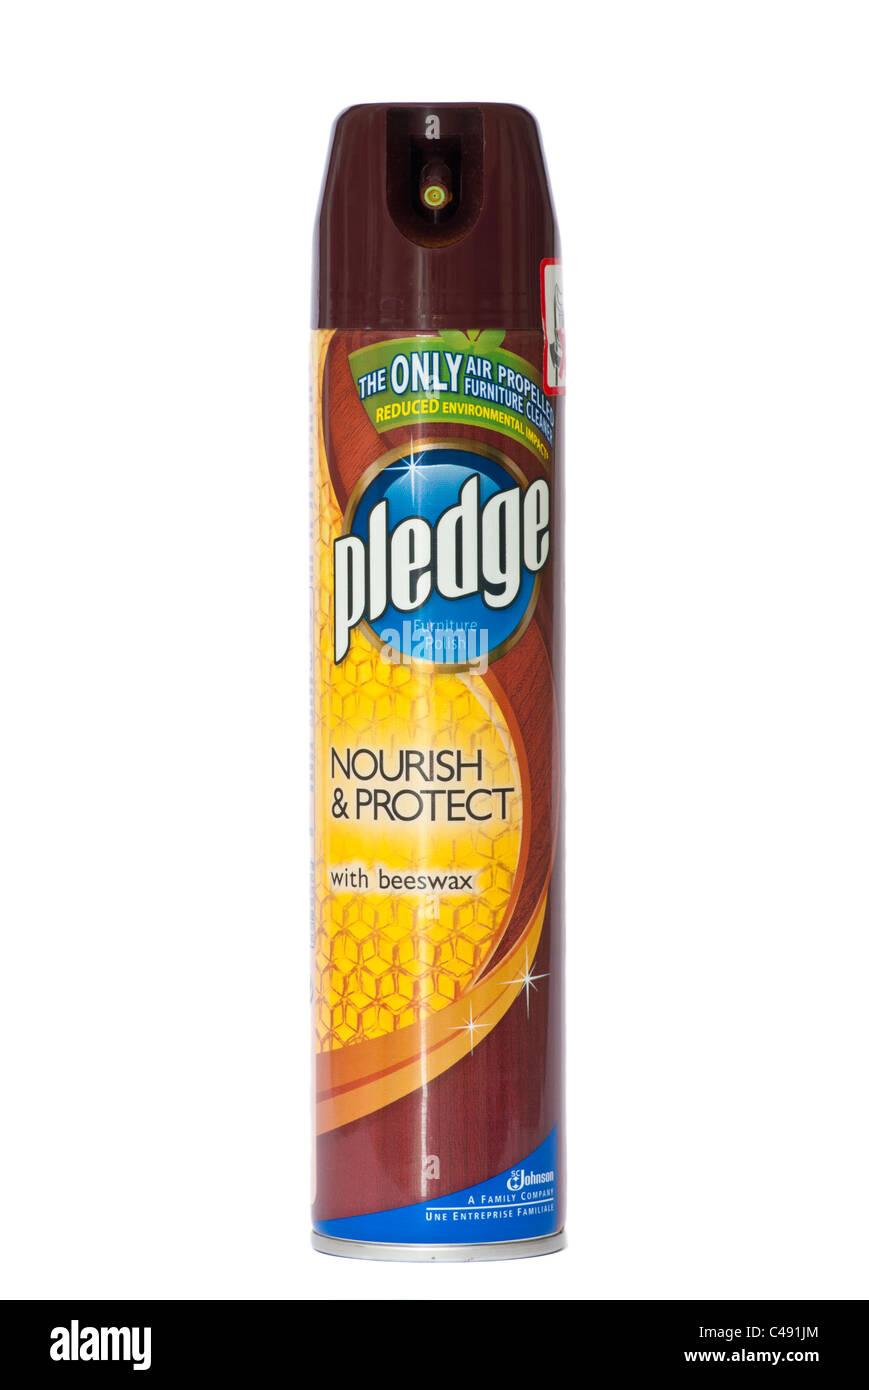 Spray Can Of Pledge Furniture Polish - Stock Image